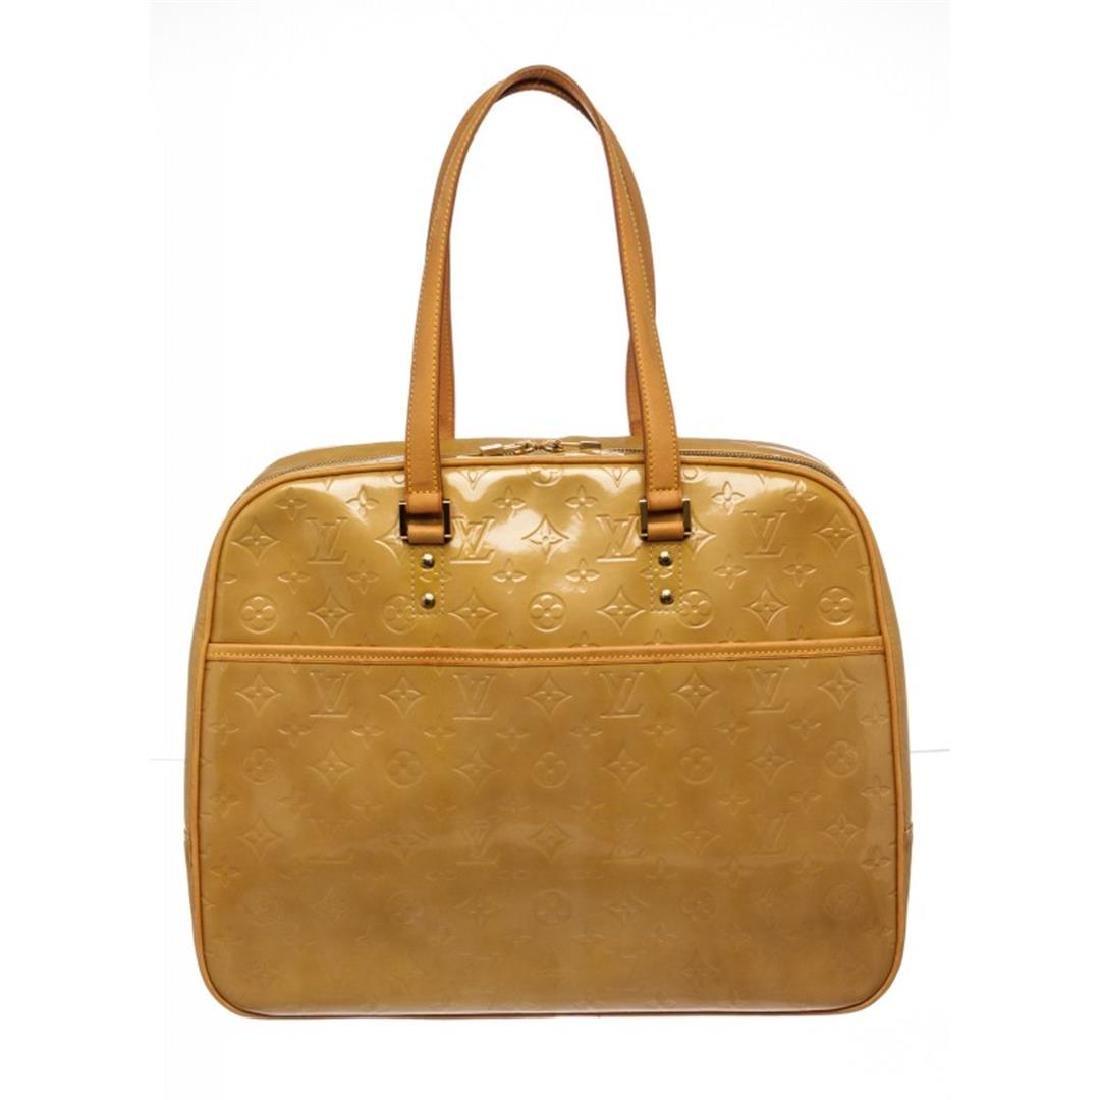 Louis Vuitton Yellow Vernis Leather Monogram Sutton